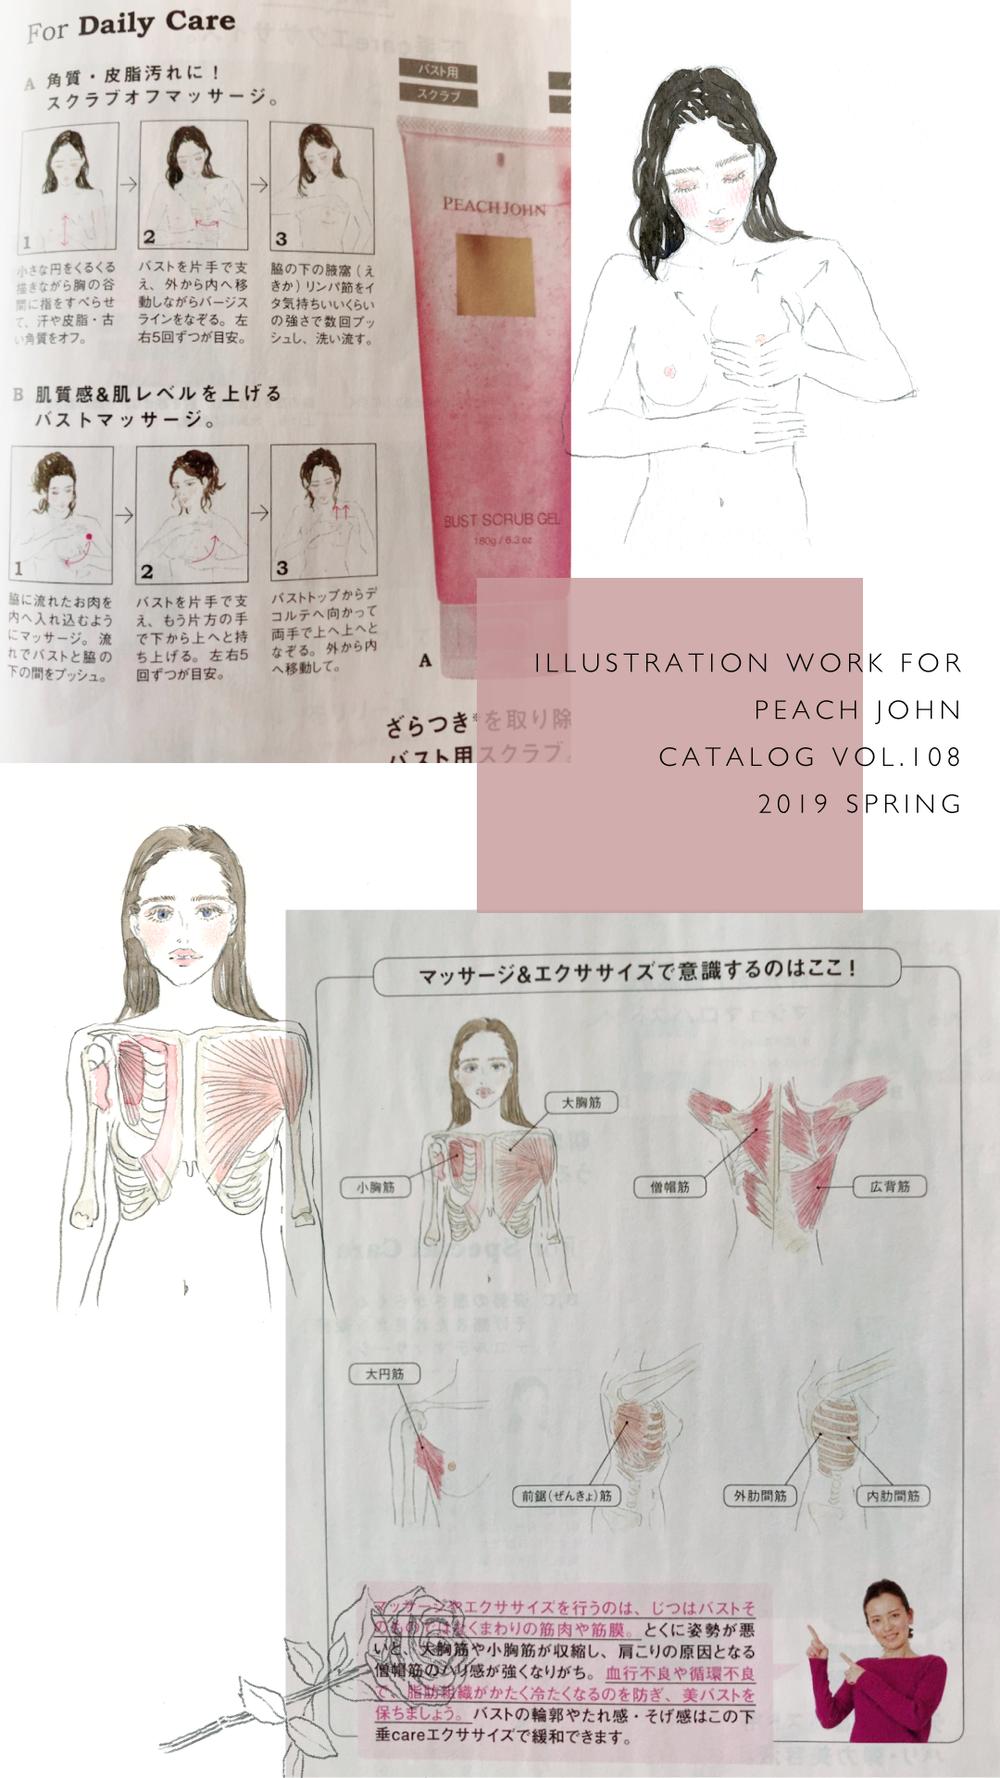 PEACHJOHN-_2019spring_vol108_yurikooyamaillustration_stories2.png